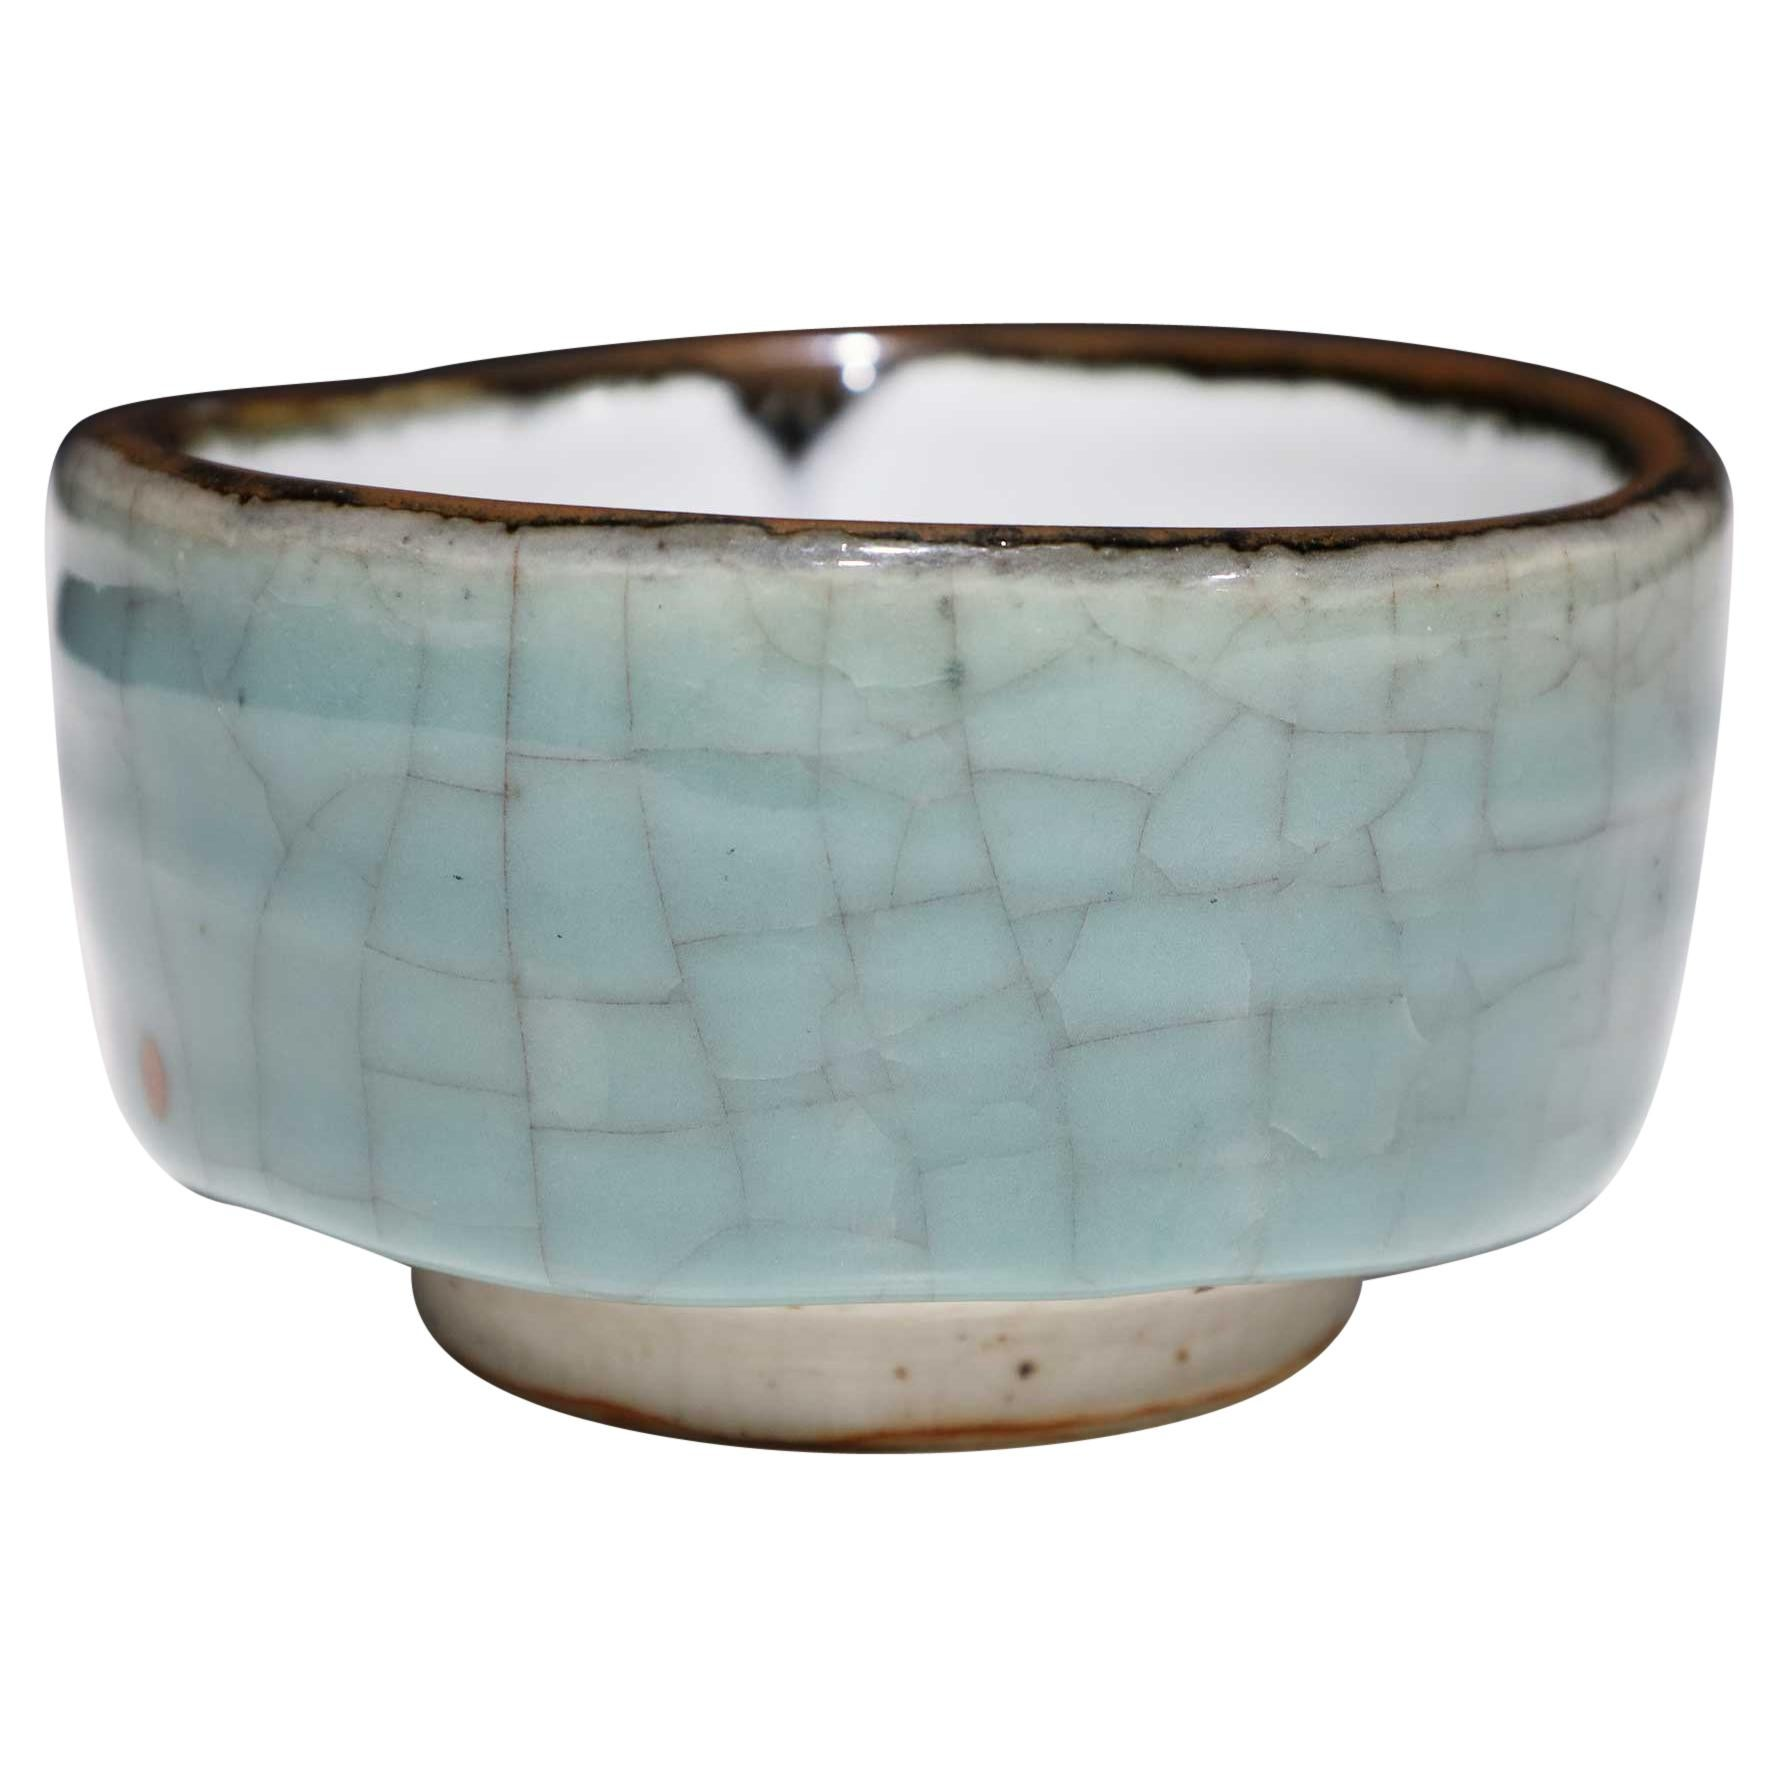 Small Ceramic Bowl by Albert Green